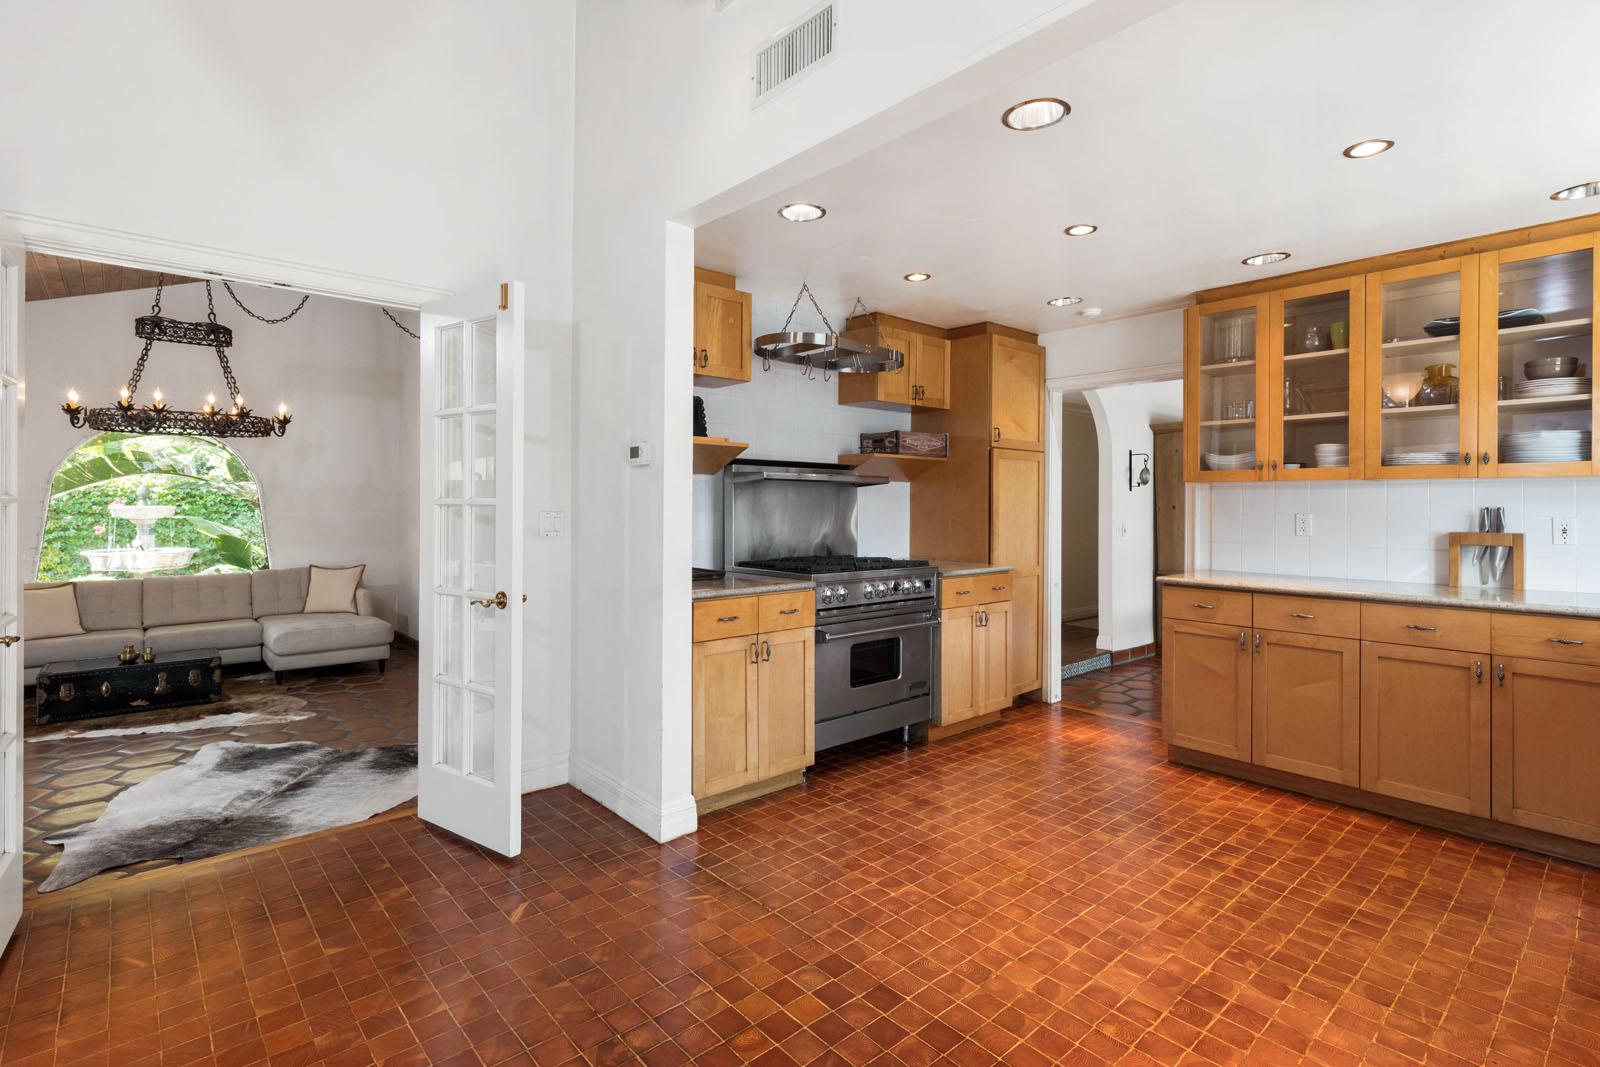 011 Kitchen 1712 Manzanita Park Avenue Malibu For Sale Lease The Malibu Life Team Luxury Real Estate.jpg